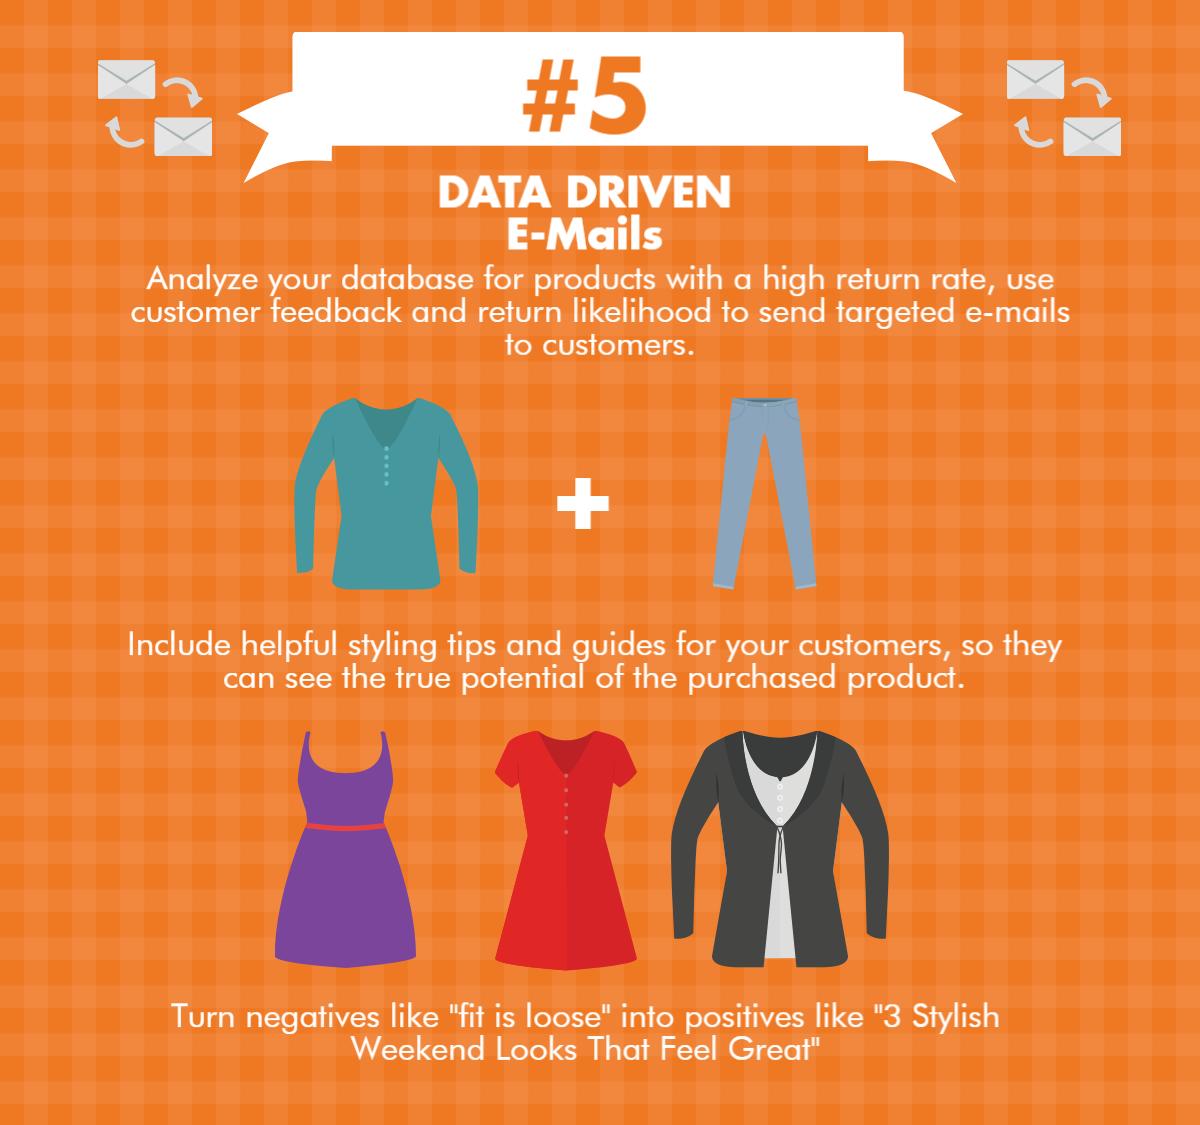 Data-driven customer e-maisl.png